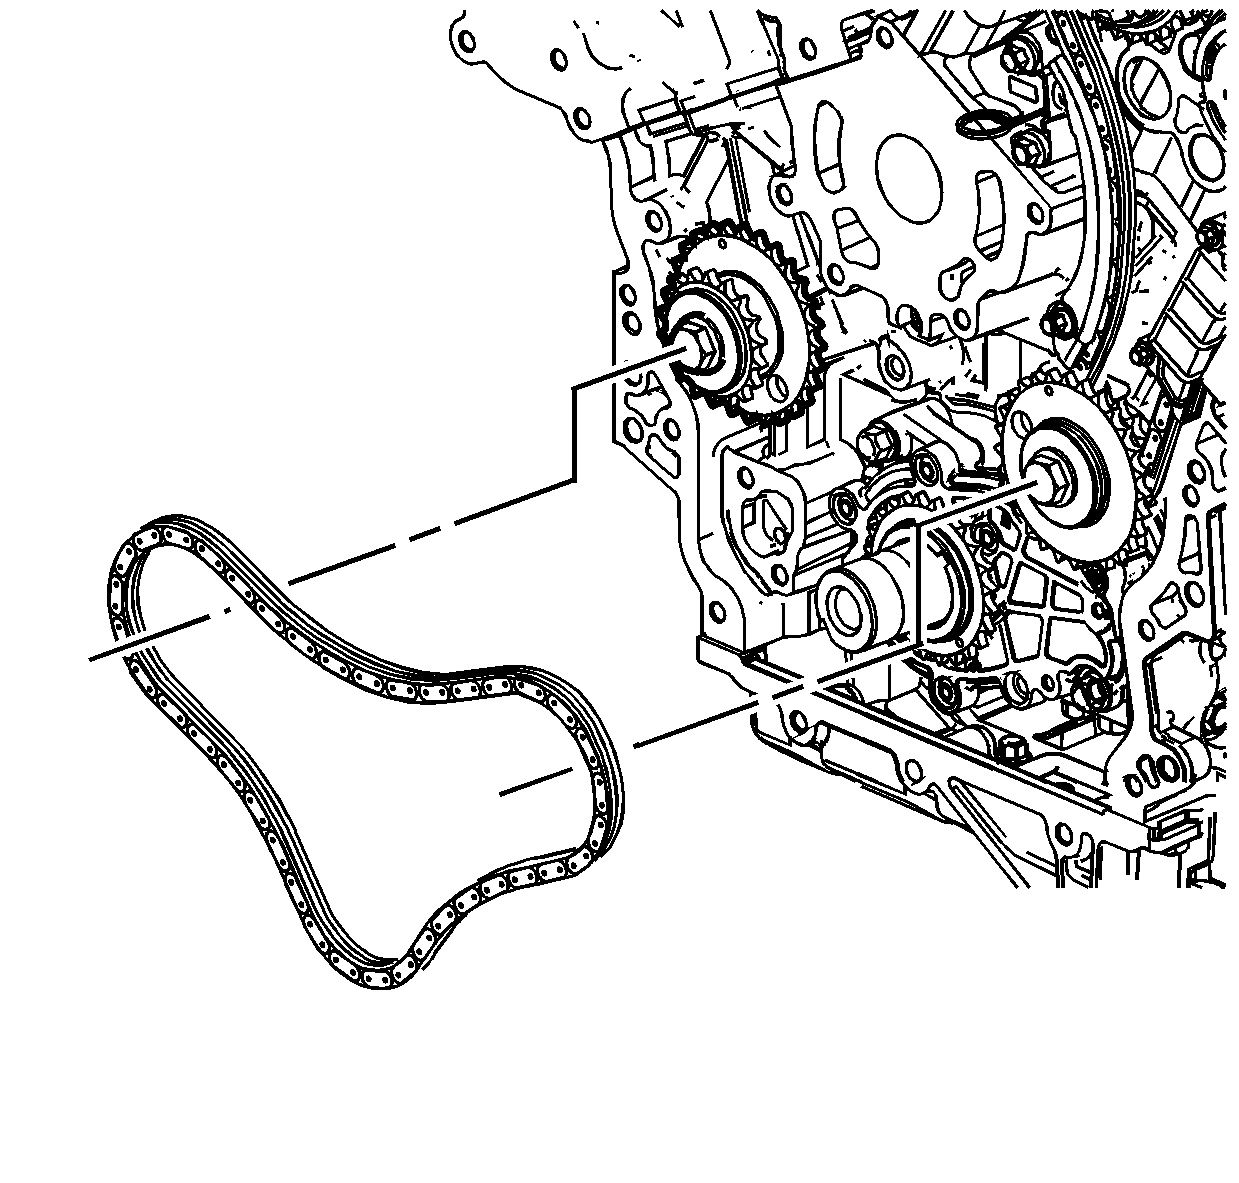 P0017 code so where is the crankshaft position/camshaft